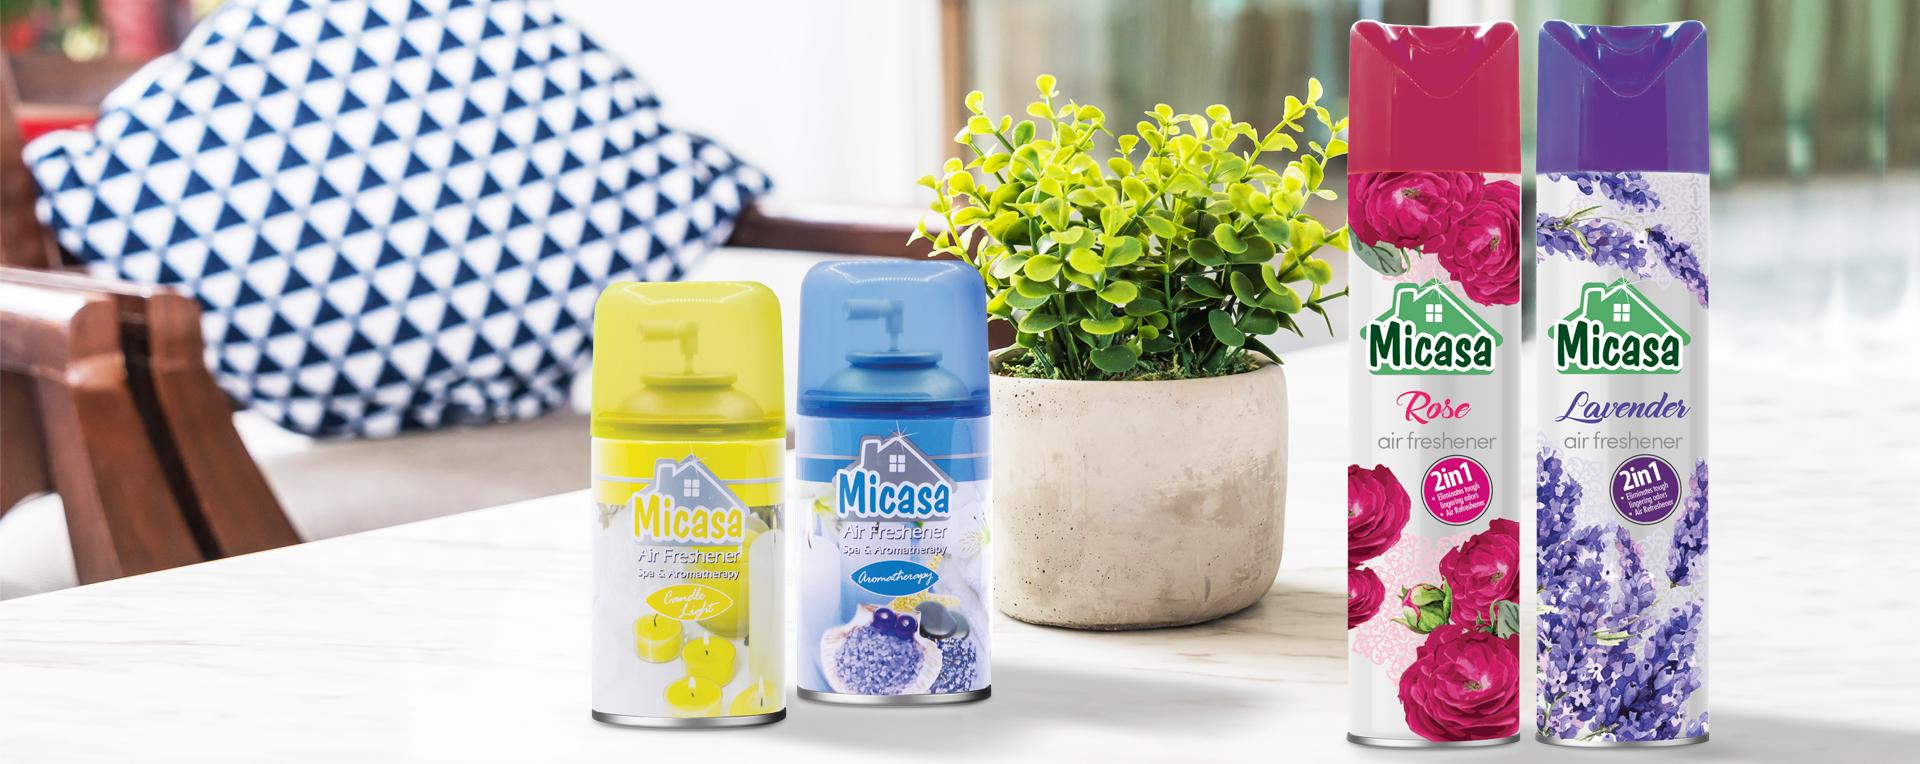 Micasa 250 ml Refill